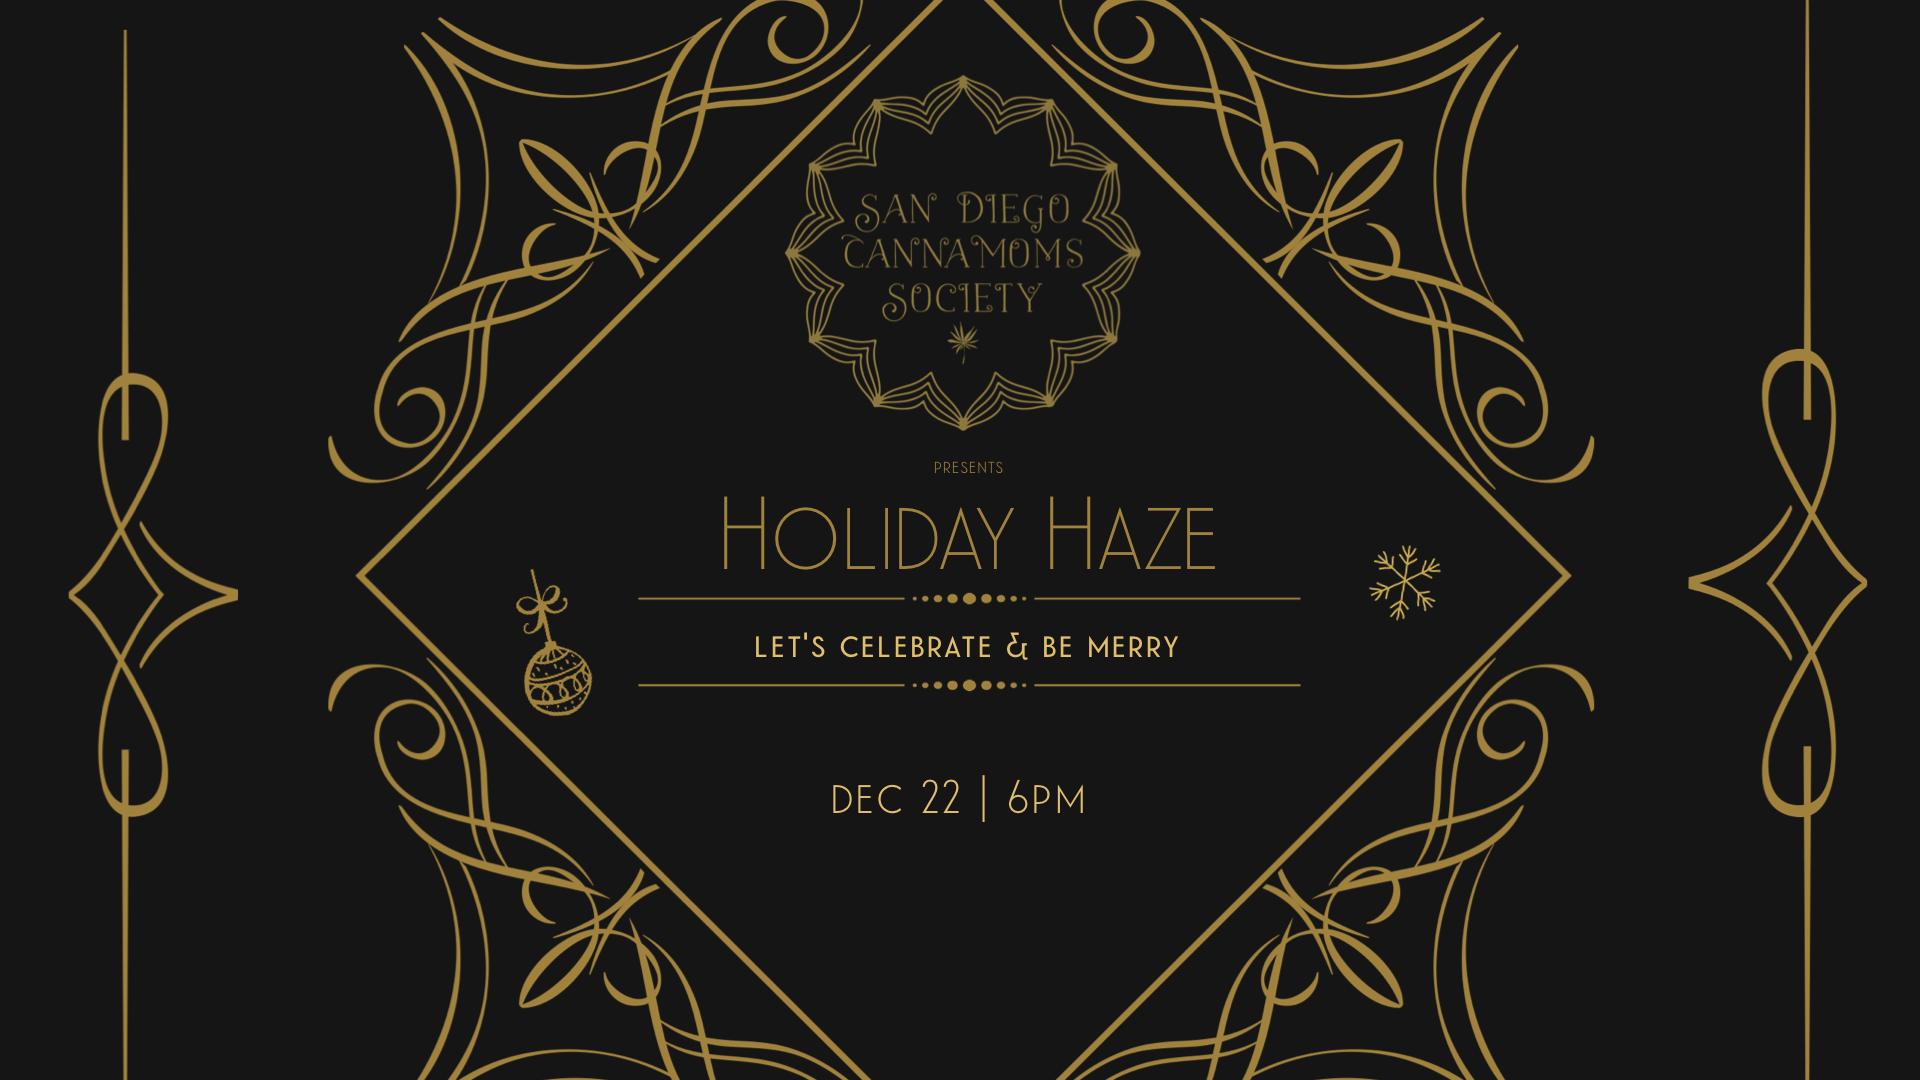 Holiday Haze